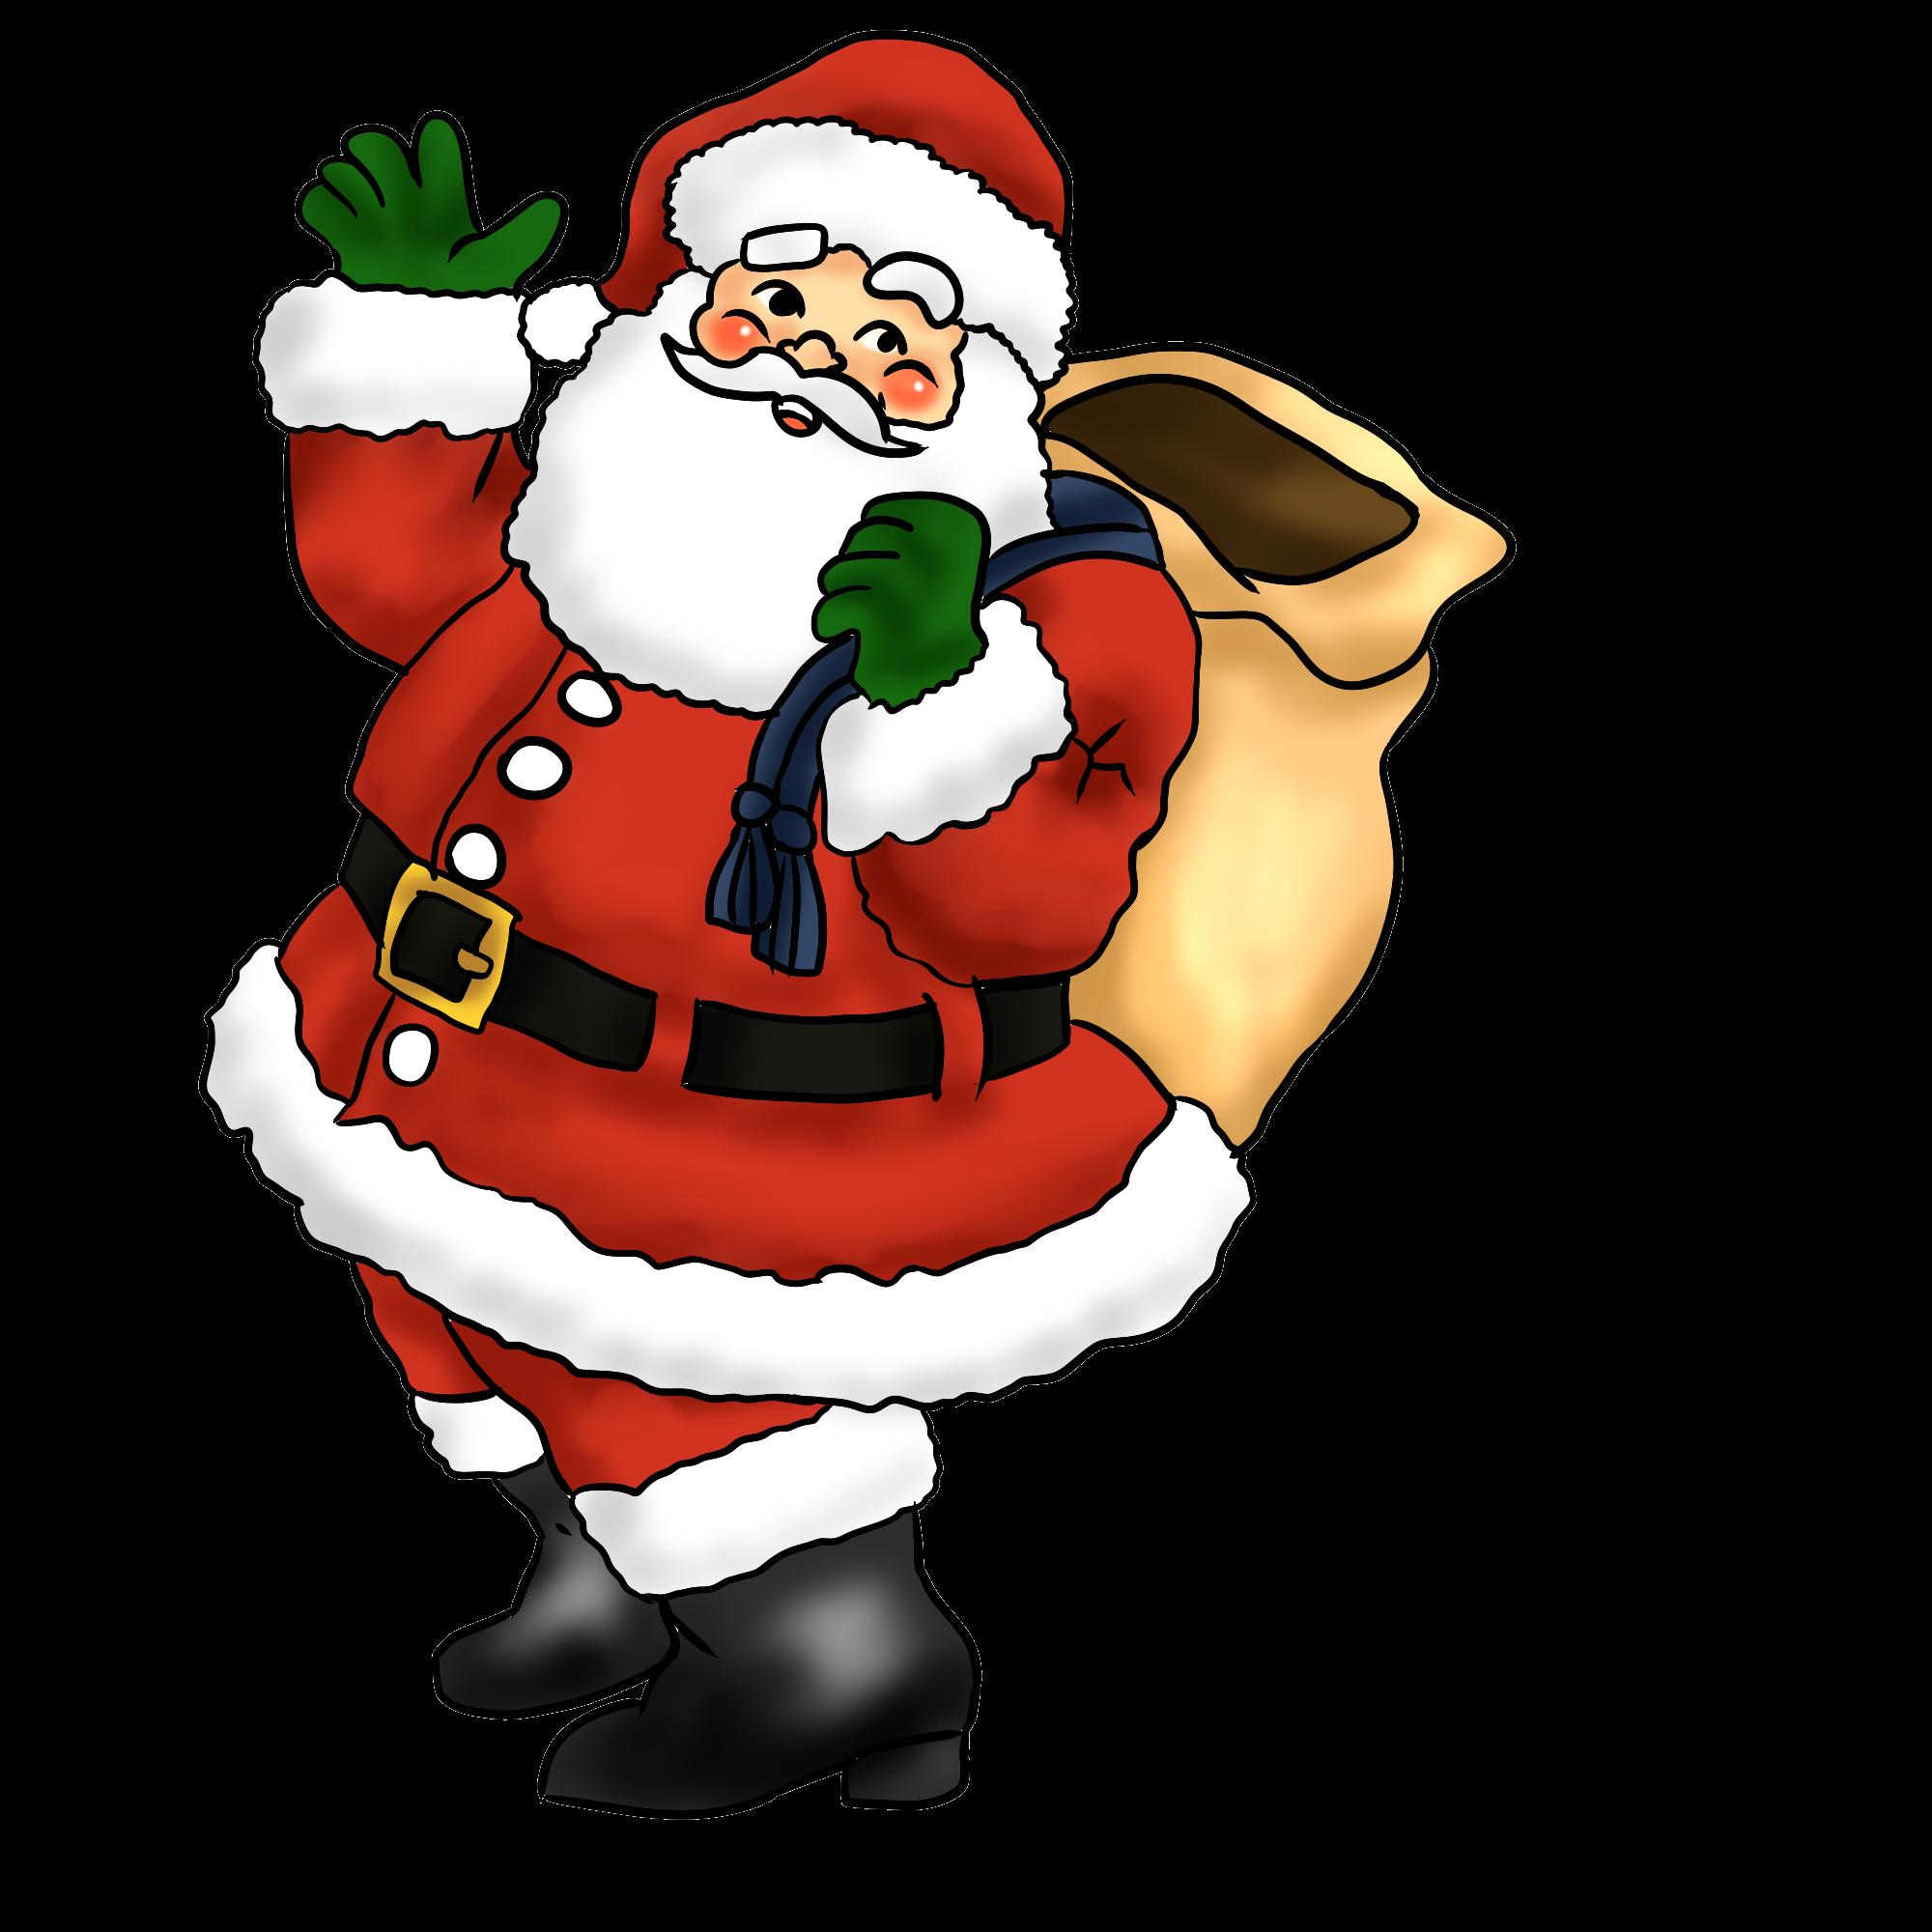 2000x2000 Free To Use Amp Public Domain Santa Claus Clip Art Page 4